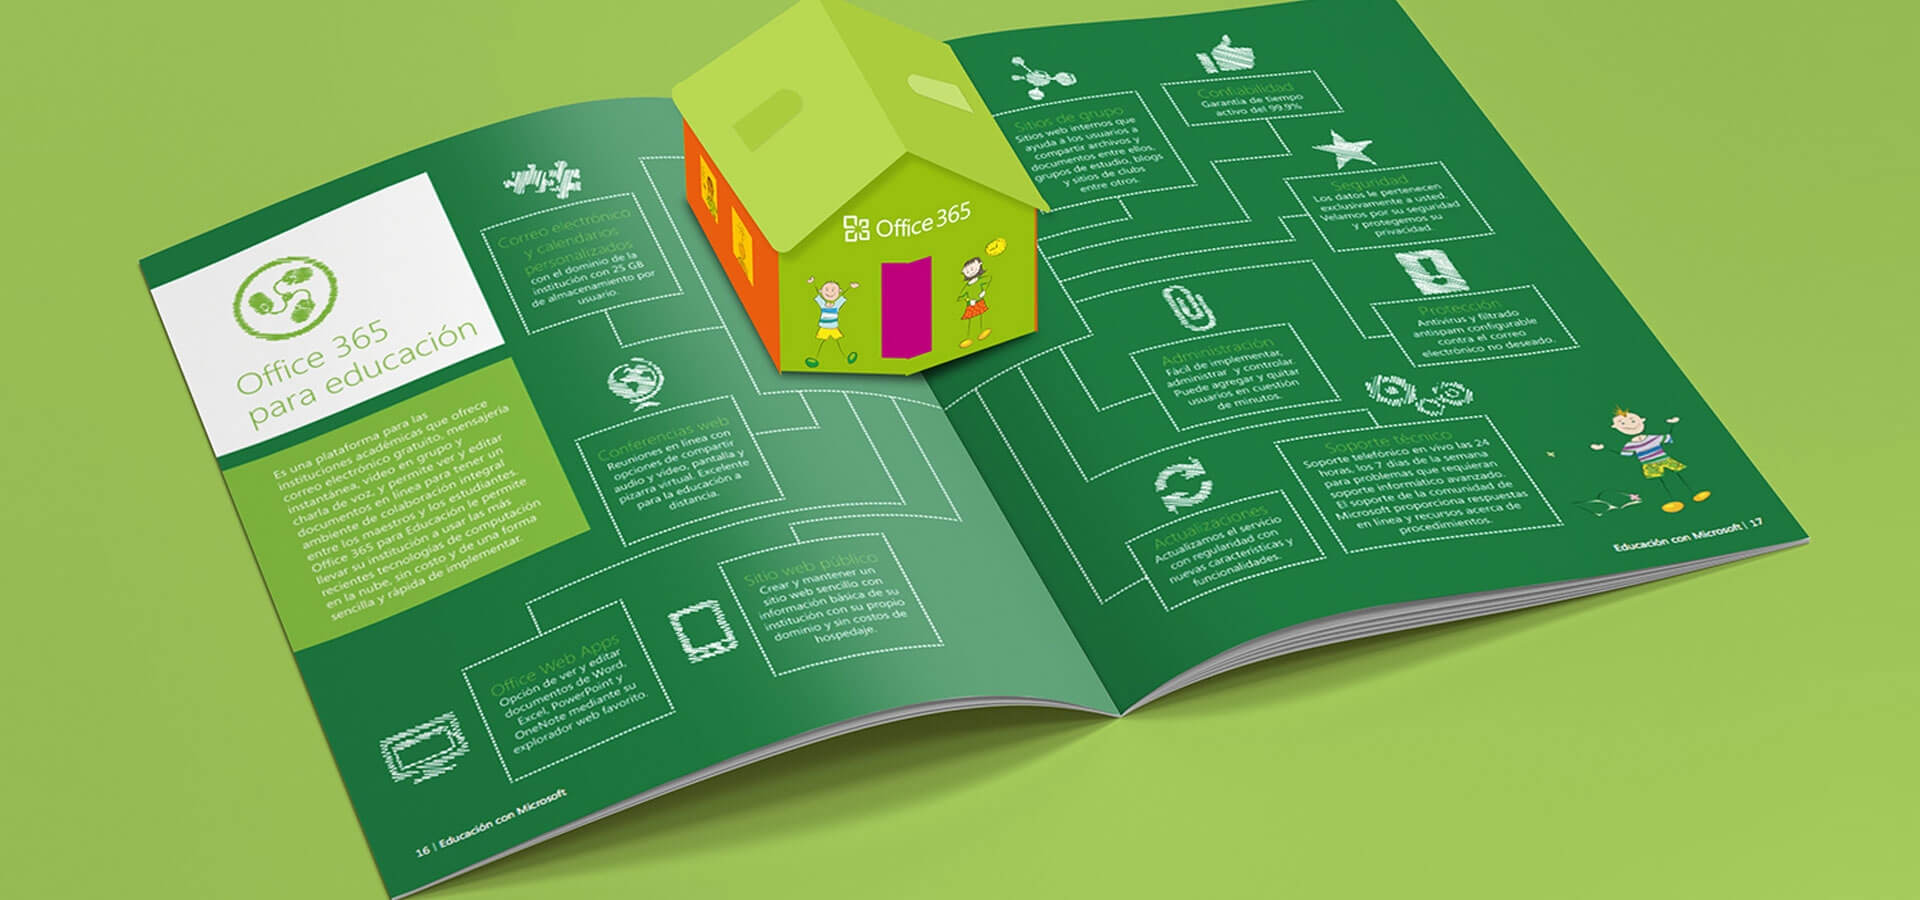 19+ 3D Pop Up Brochure Designs | Free & Premium Templates Intended For Pop Up Brochure Template